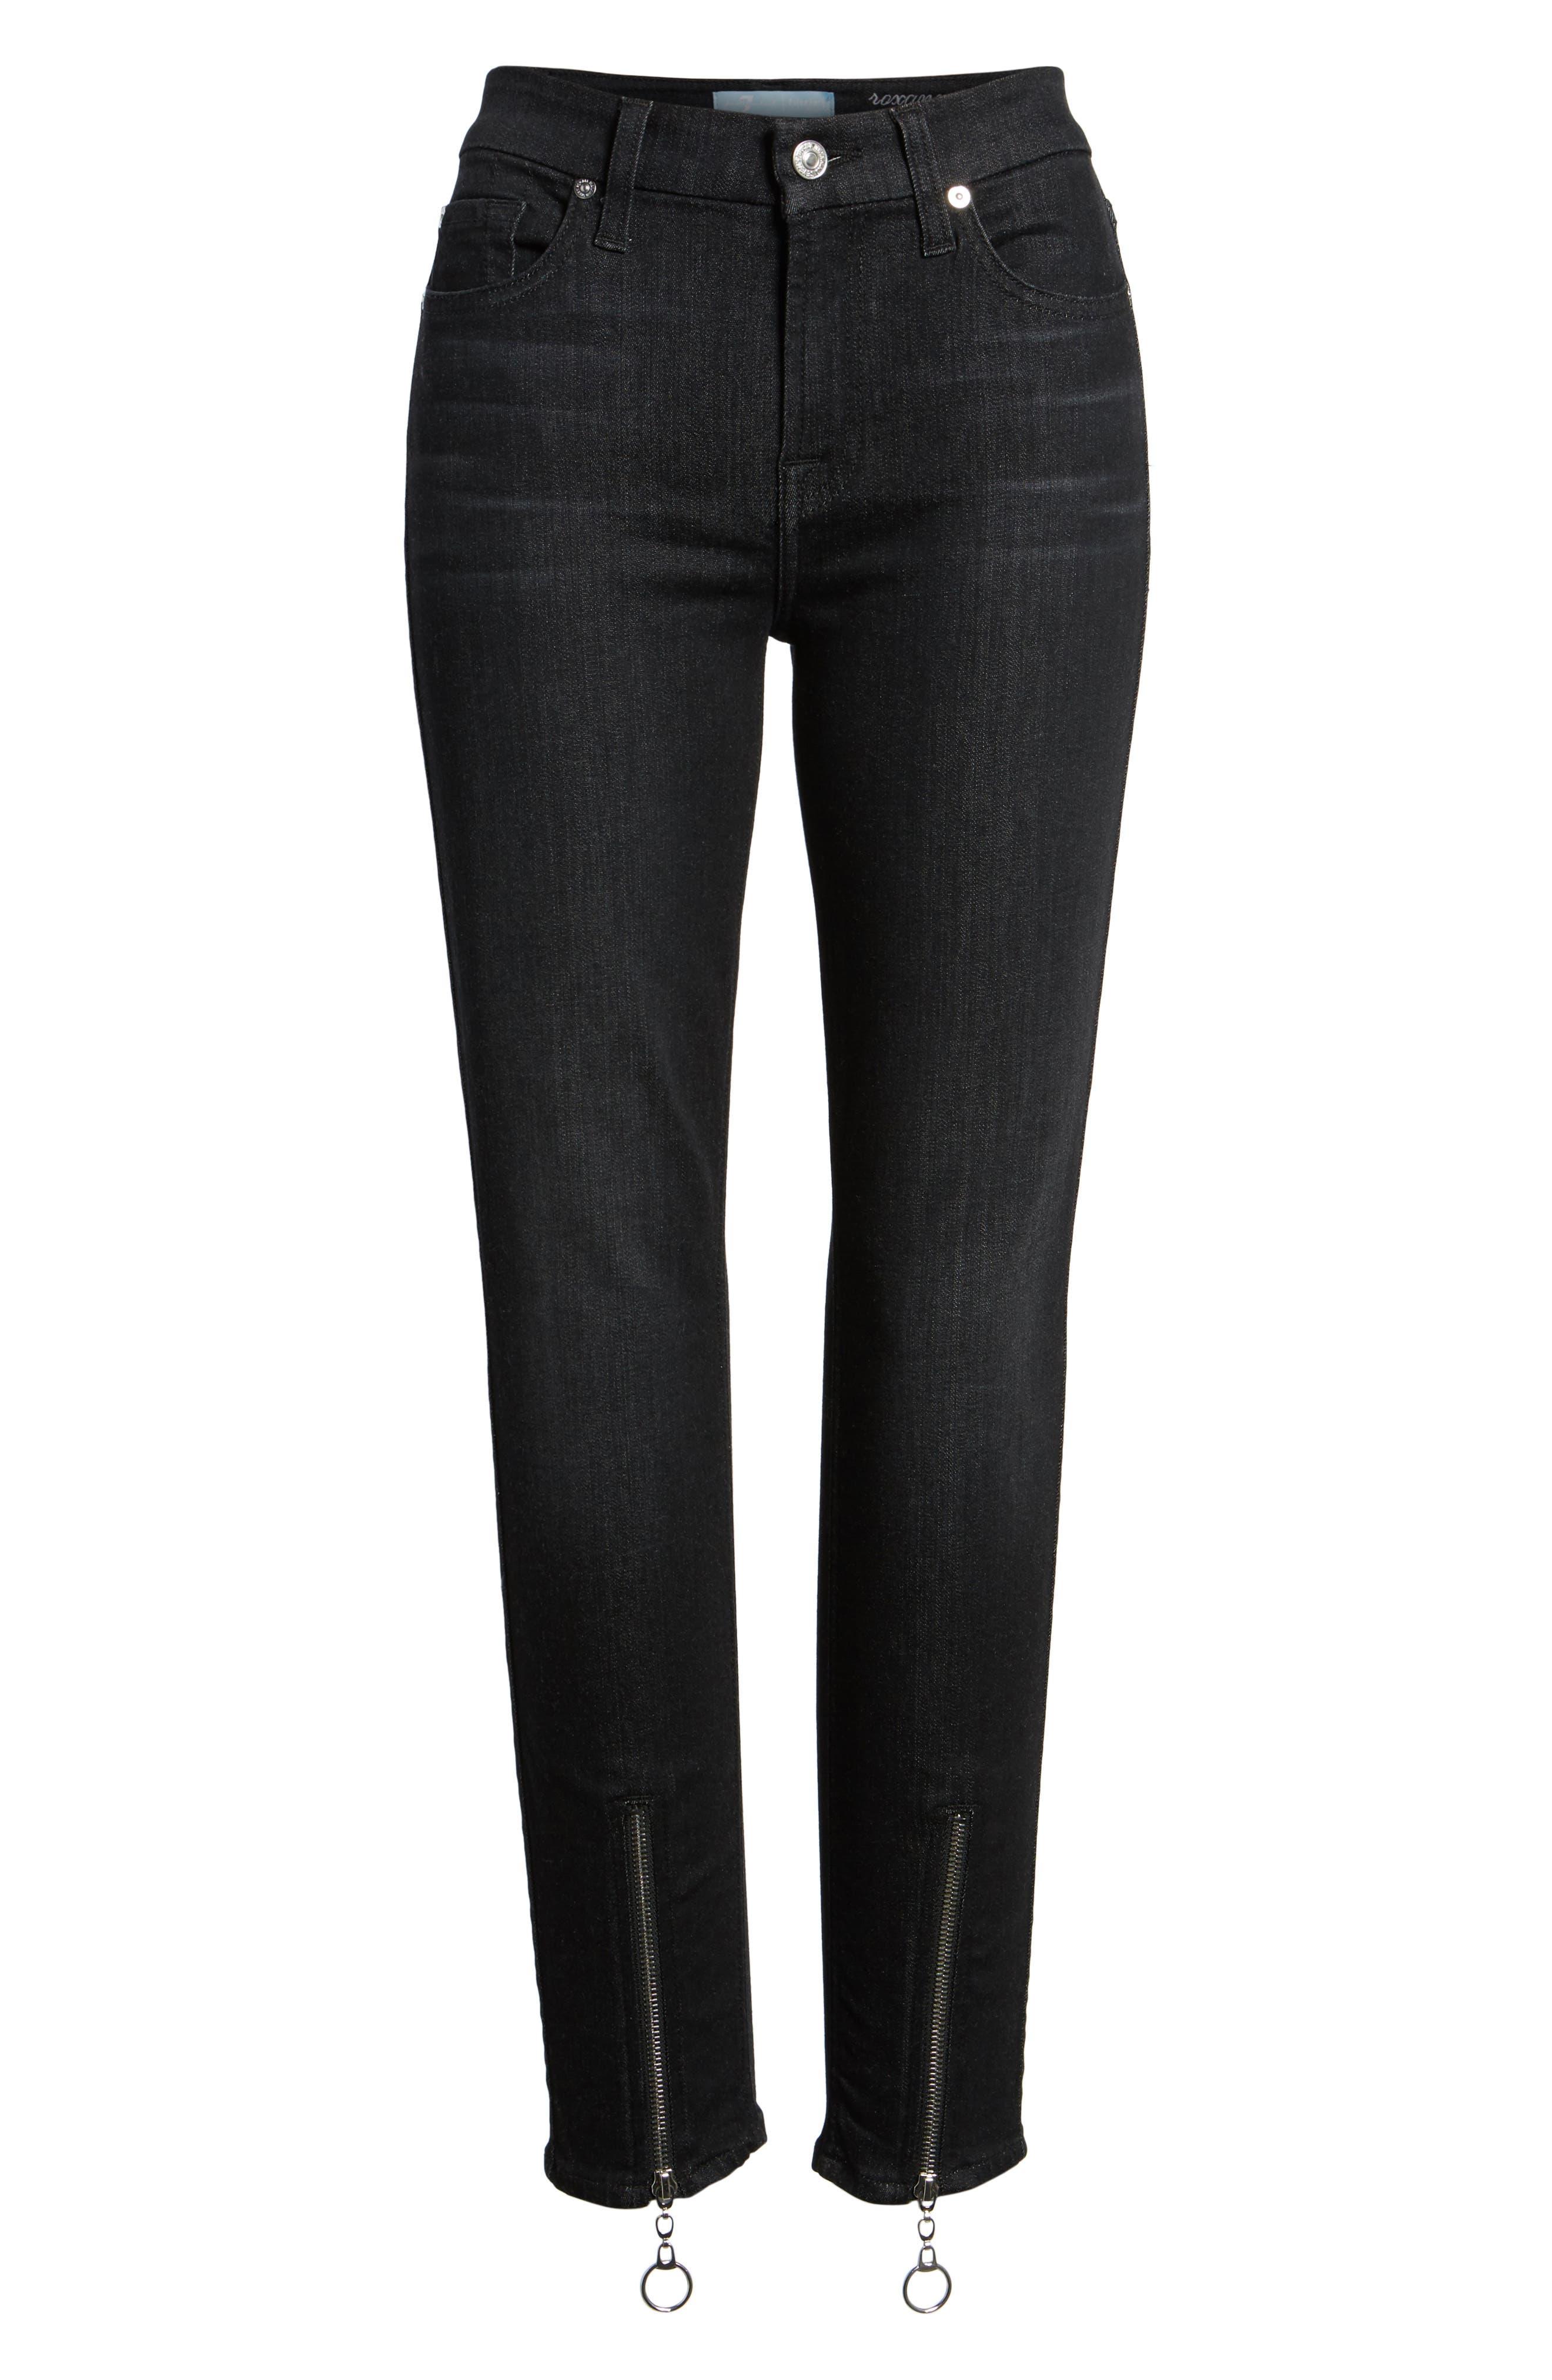 b(air) - Roxanne Ankle Zip Jeans,                             Alternate thumbnail 6, color,                             Bair Noir